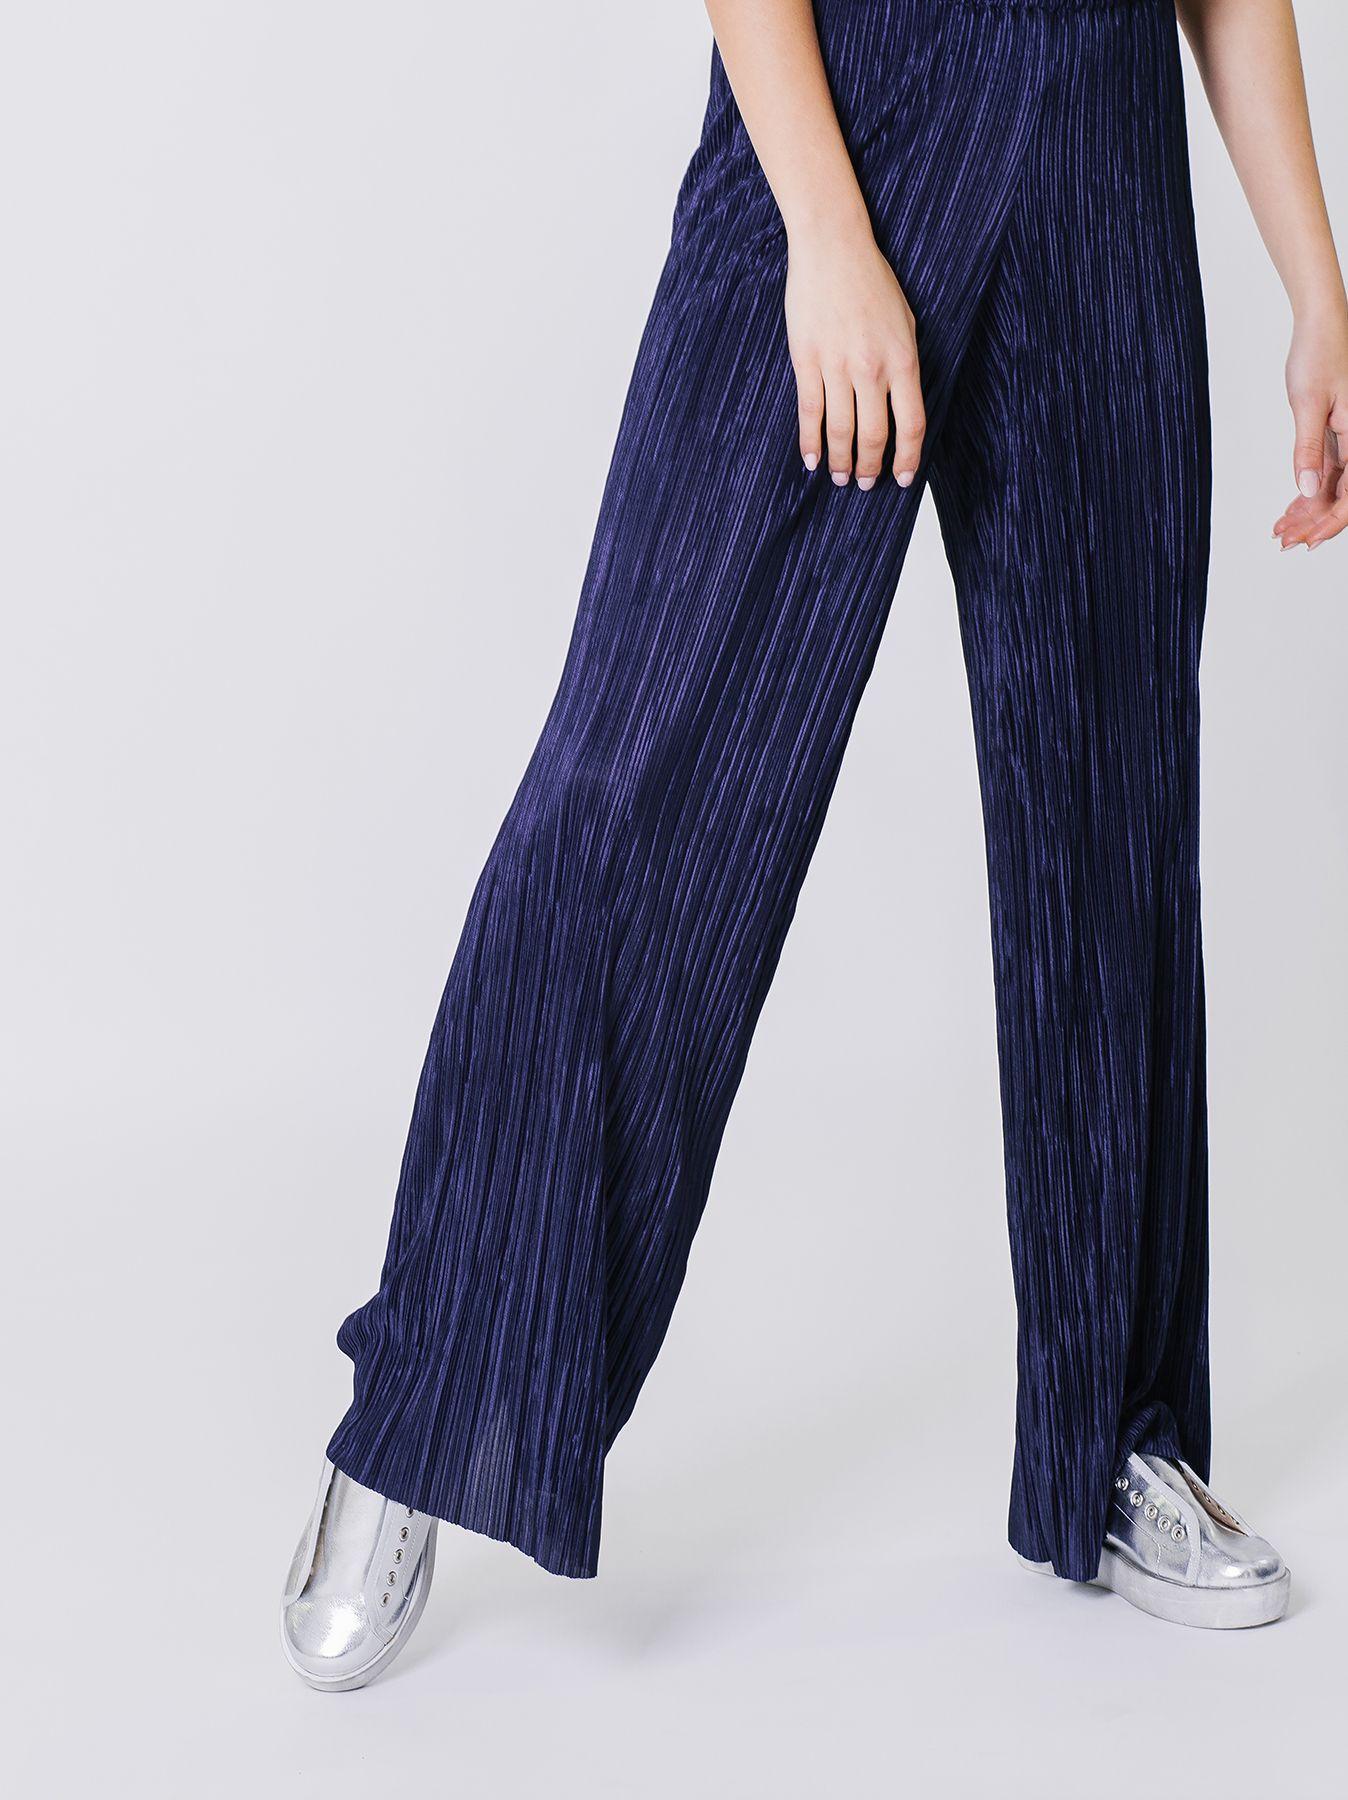 Pantalone palazzo in micro plissé